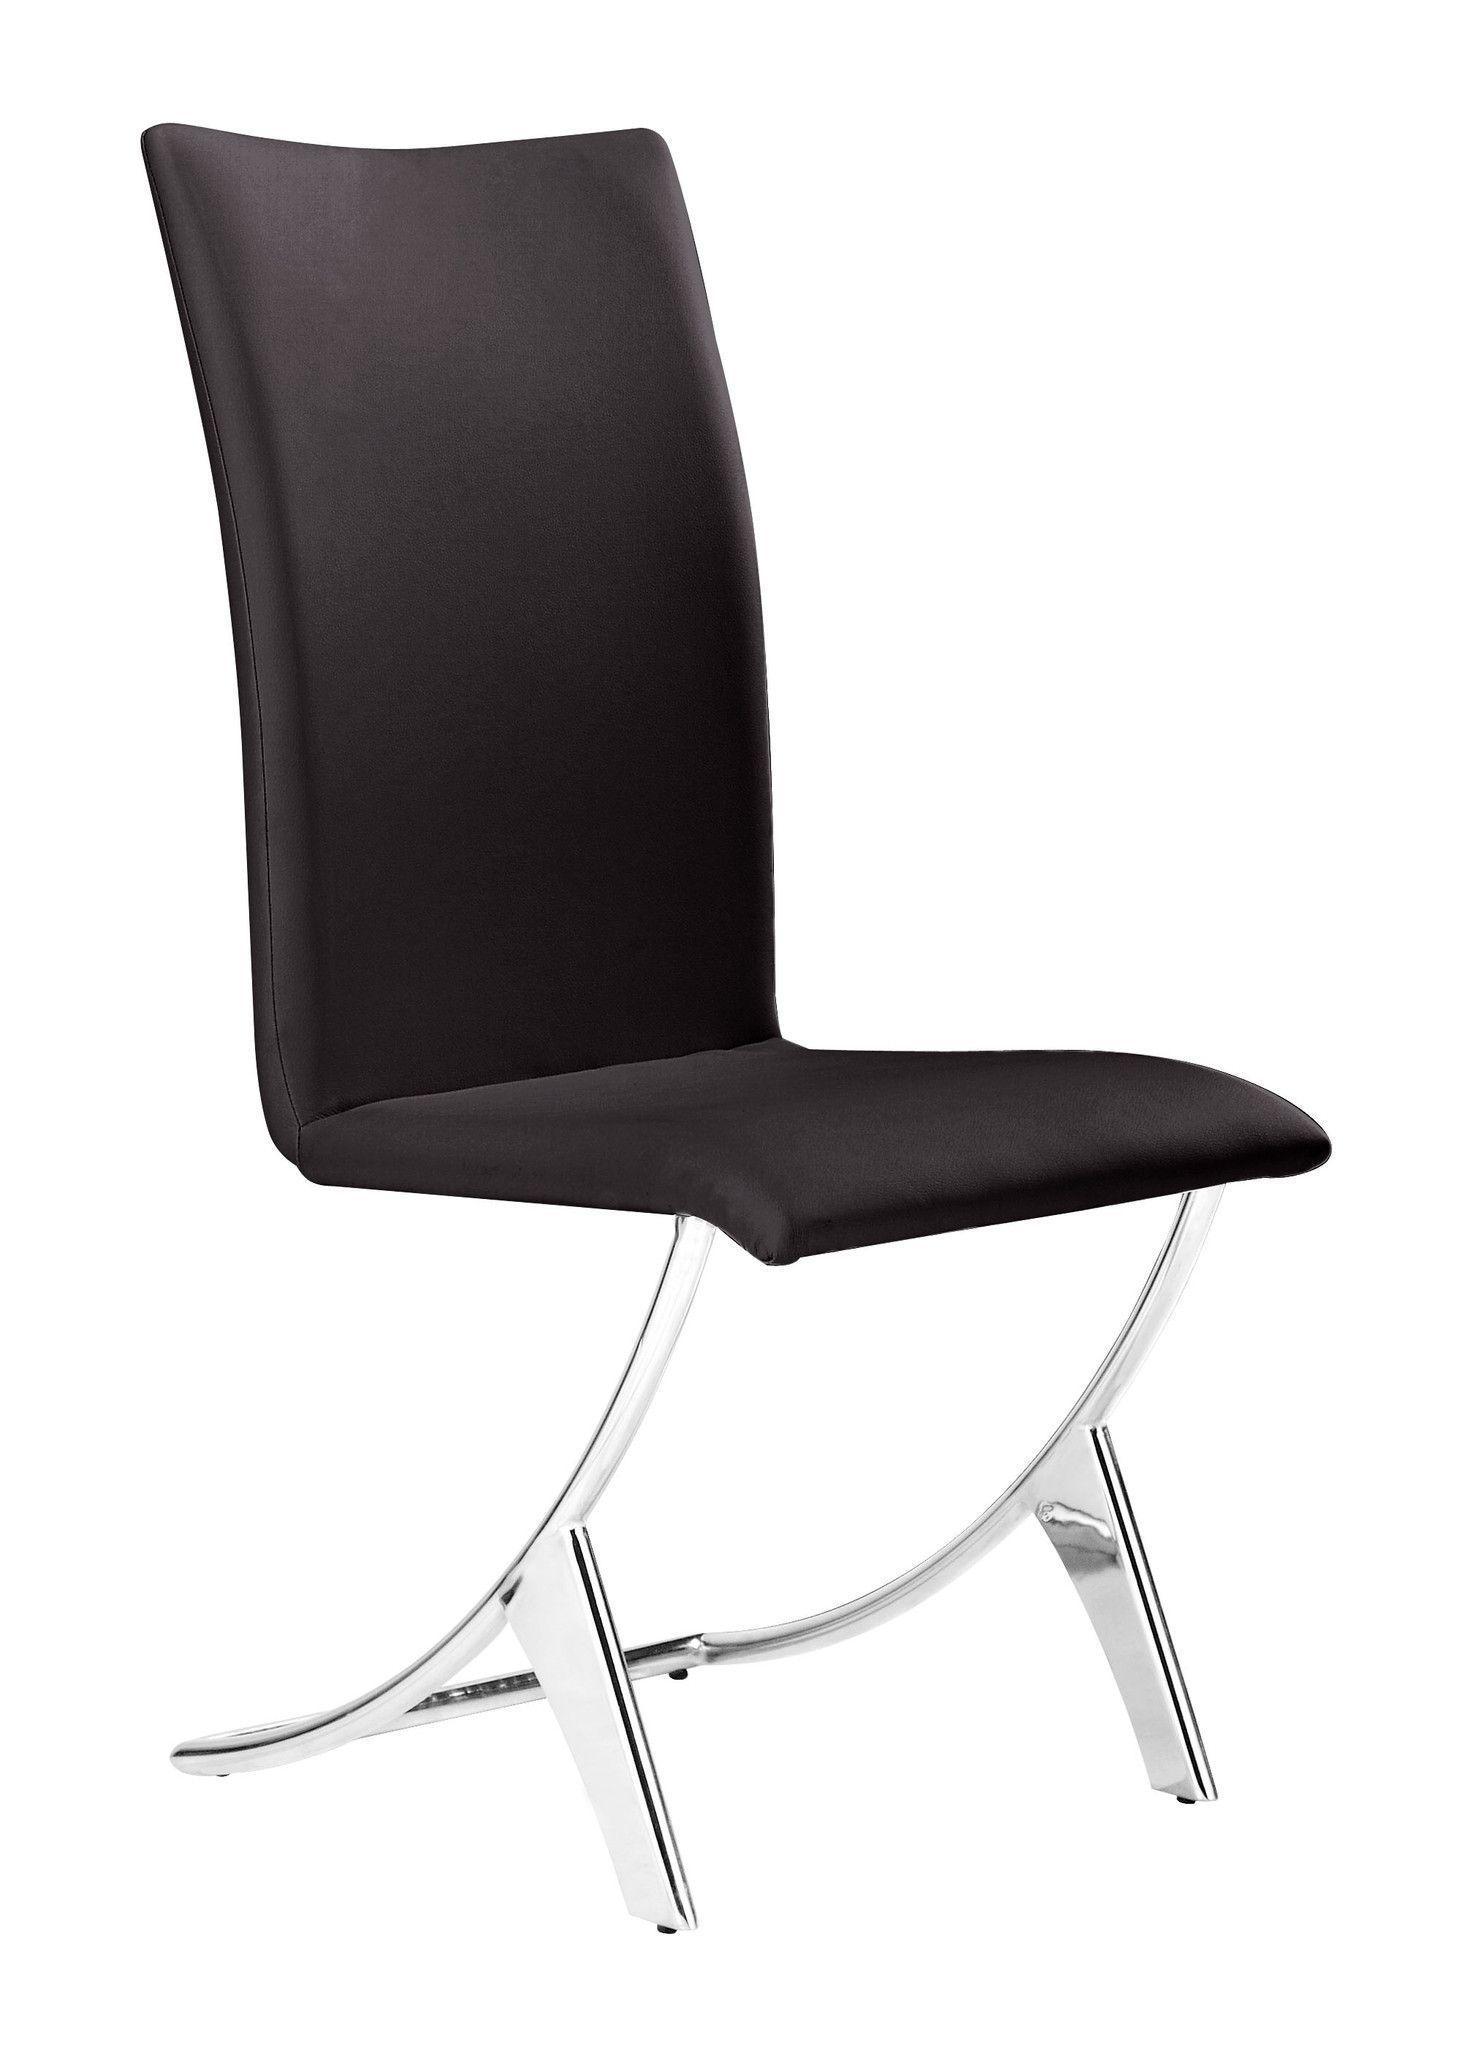 Delfin Dining Chair Espresso